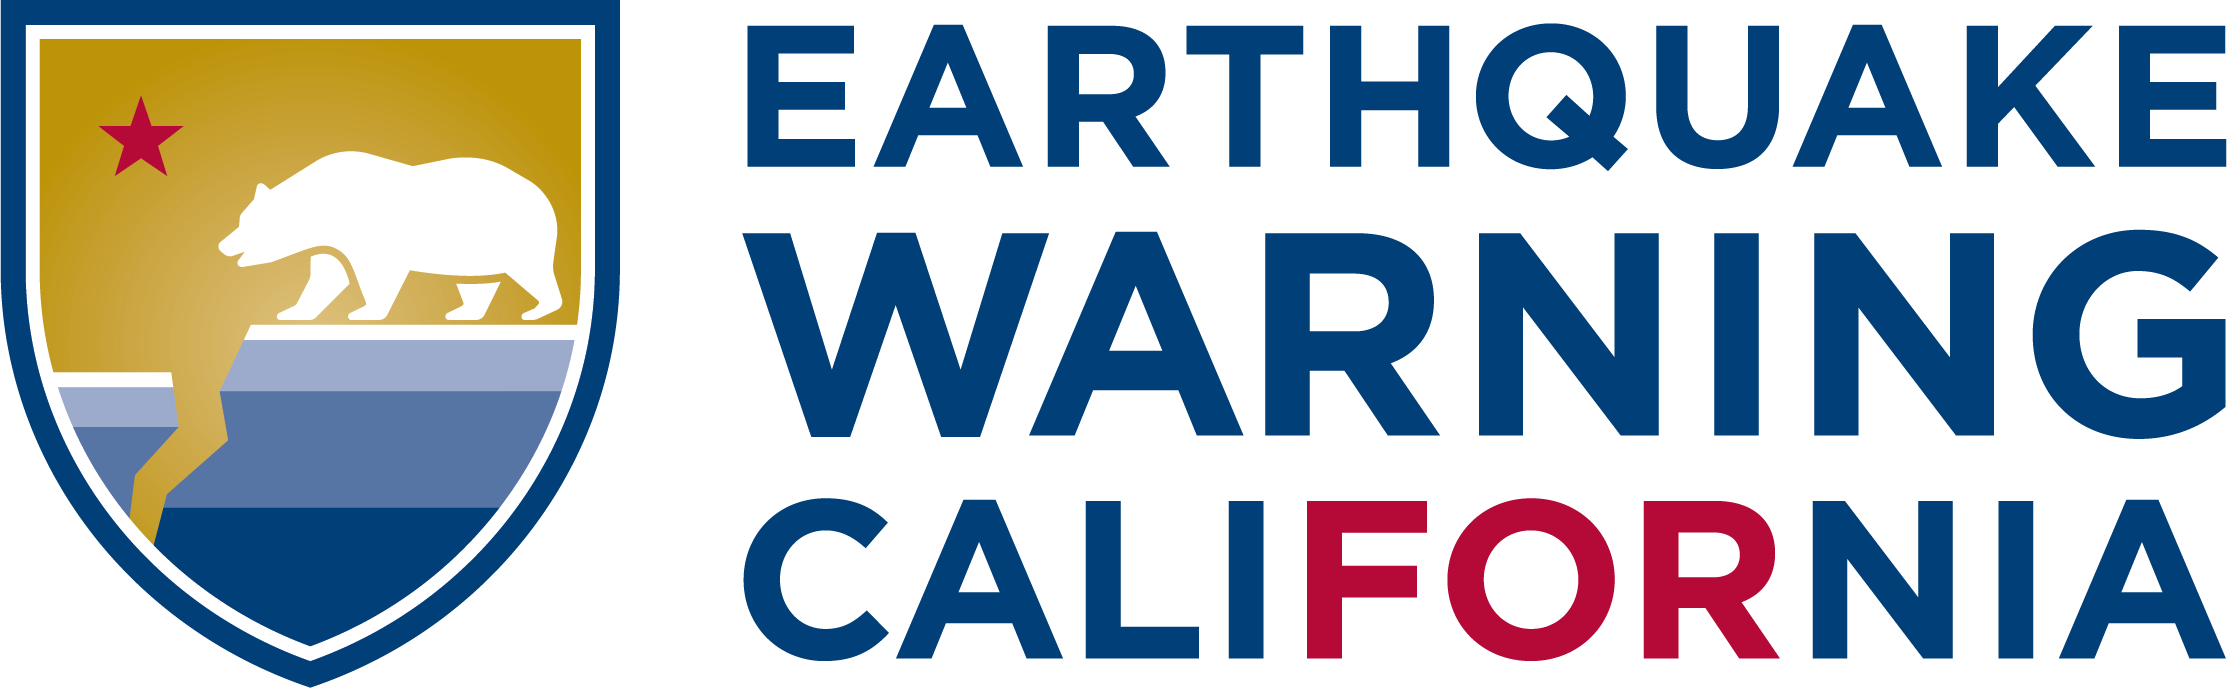 Earthquake Early Warning for California